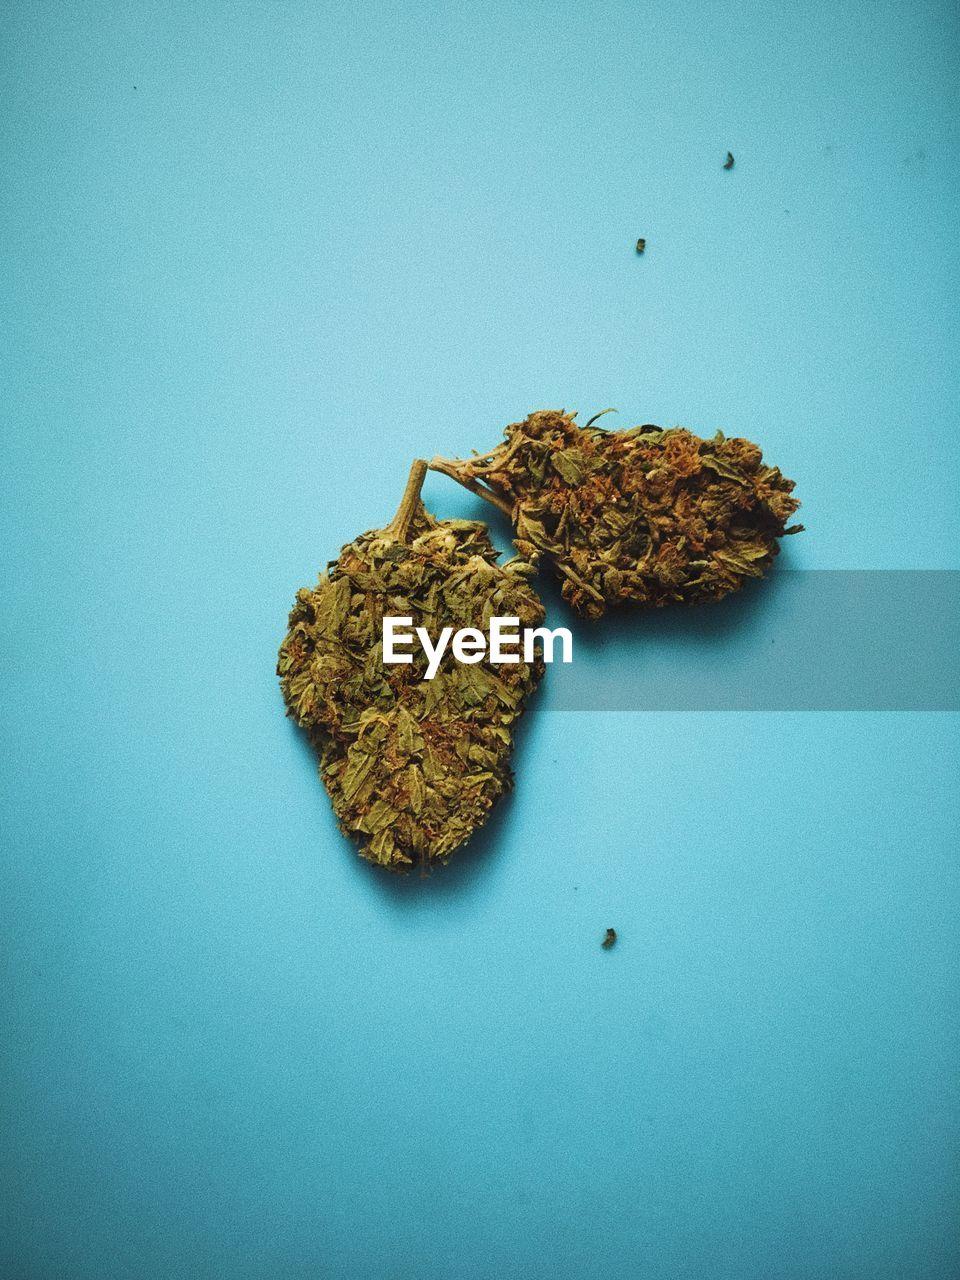 Close-Up Of Marijuana On Blue Table